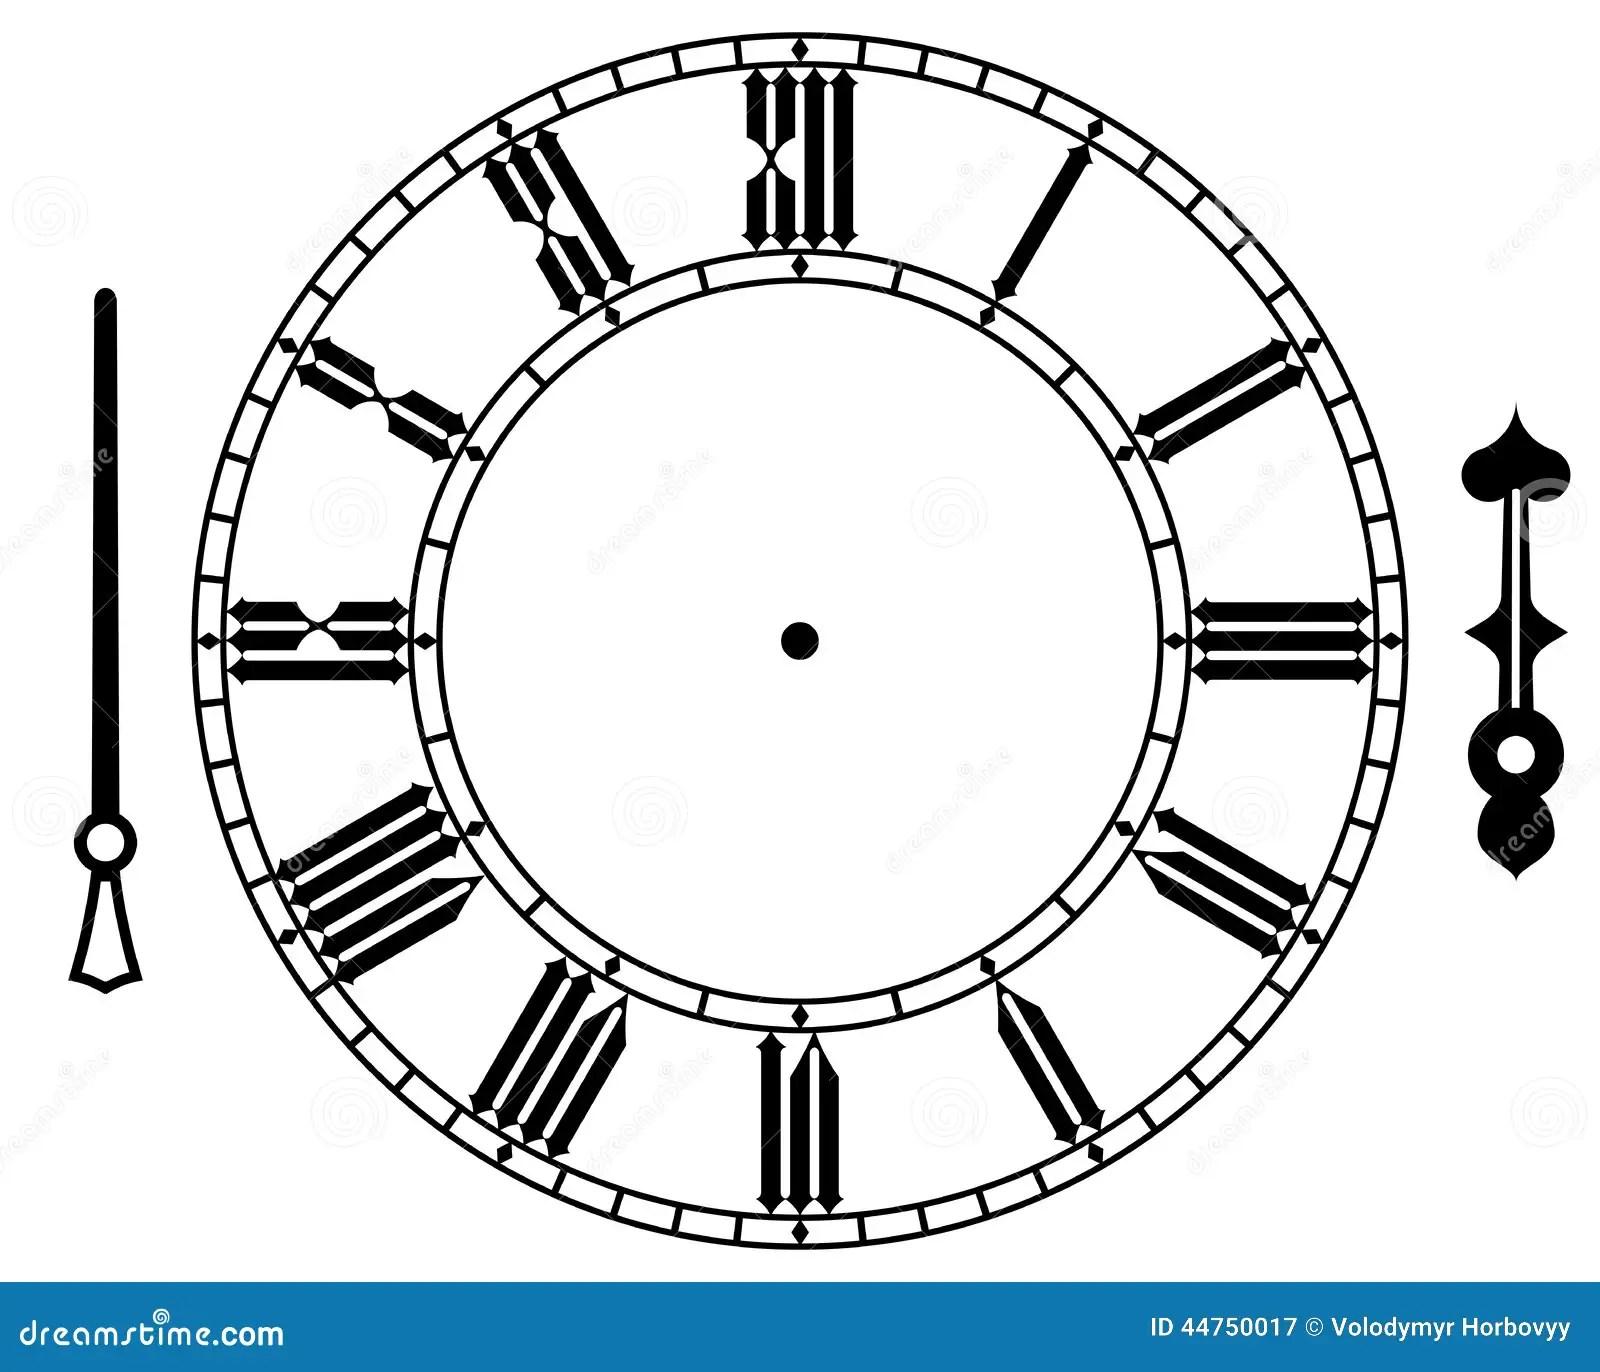 A P Old Clocks